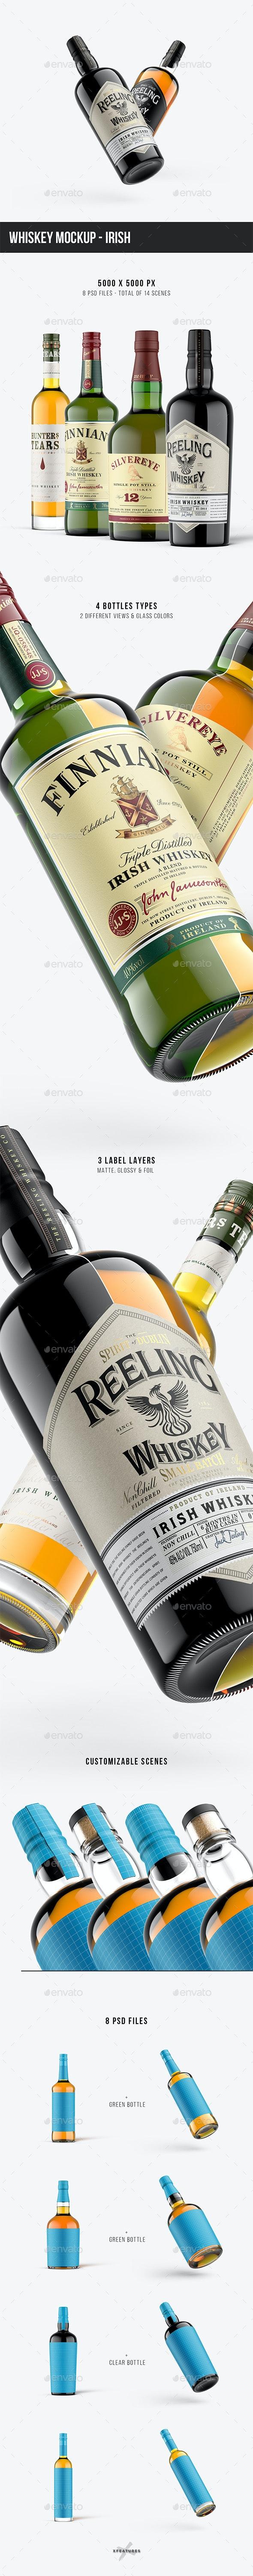 Whiskey Mockup - Irish - Food and Drink Packaging